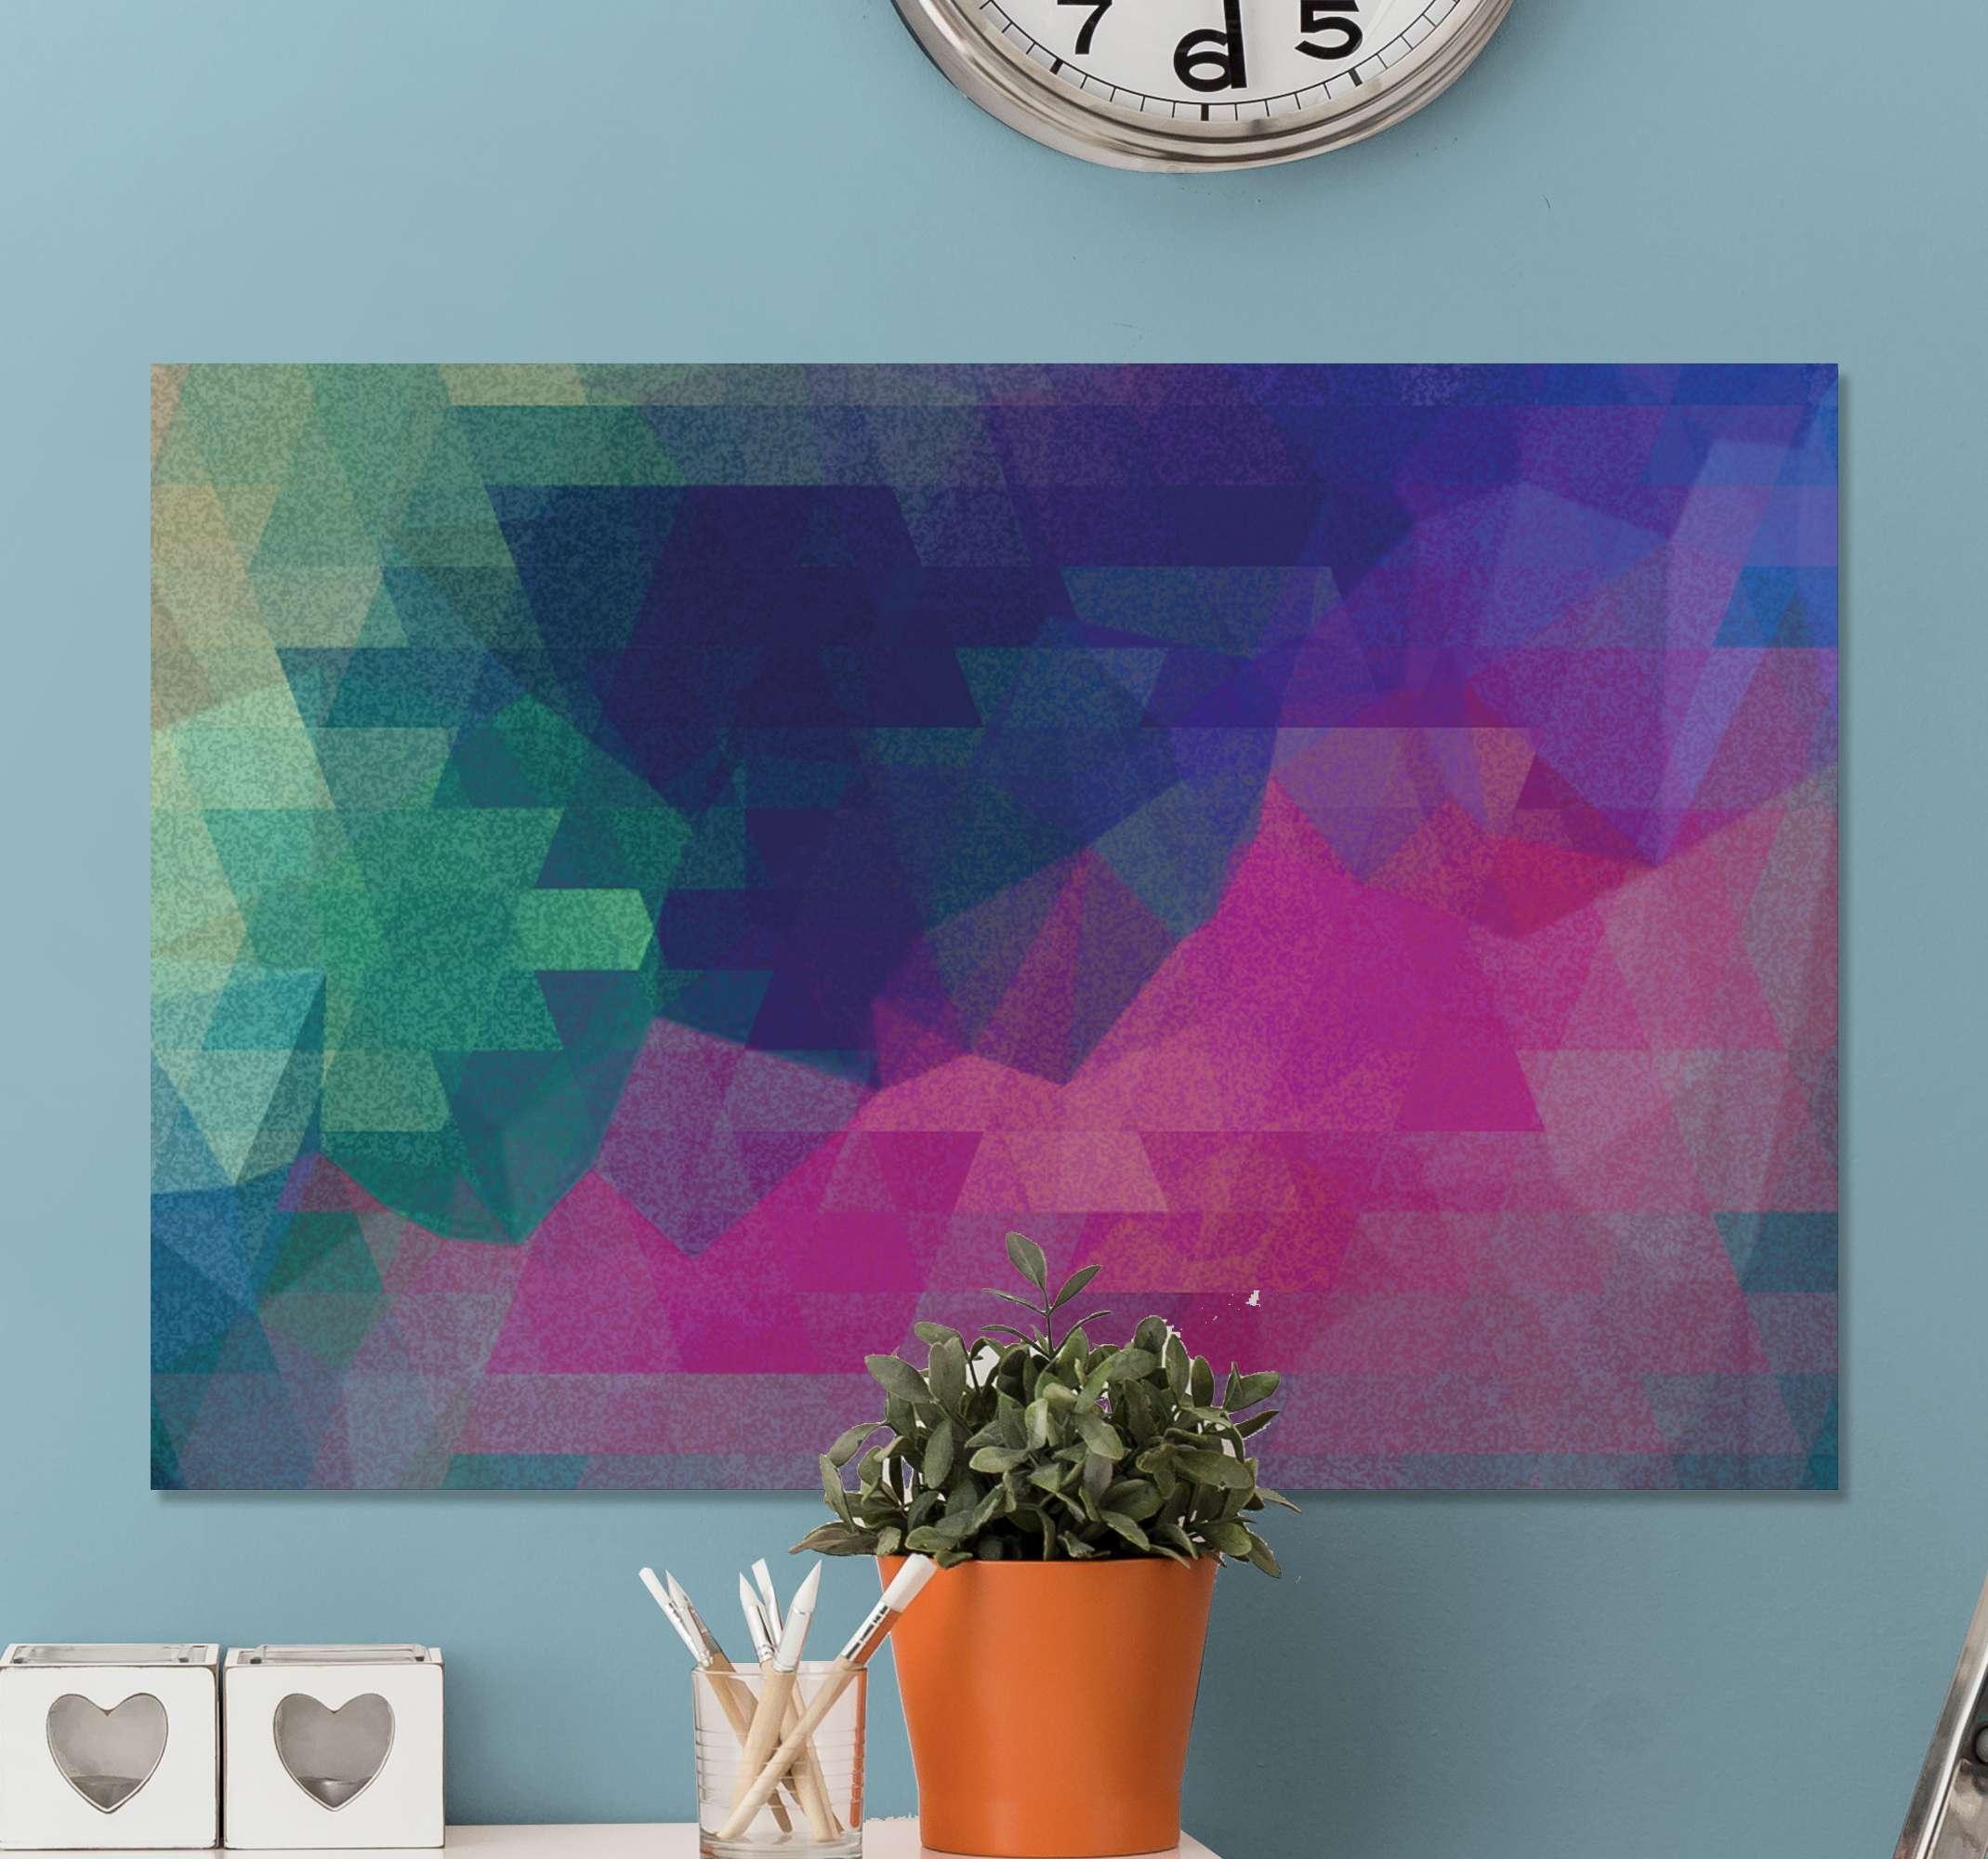 TenStickers. 马赛克抽象彩色照片马赛克帆布. 该办公室画布墙艺术可以放置在您房屋的任何区域。用这张画布打动您的朋友和家人!送货上门 !